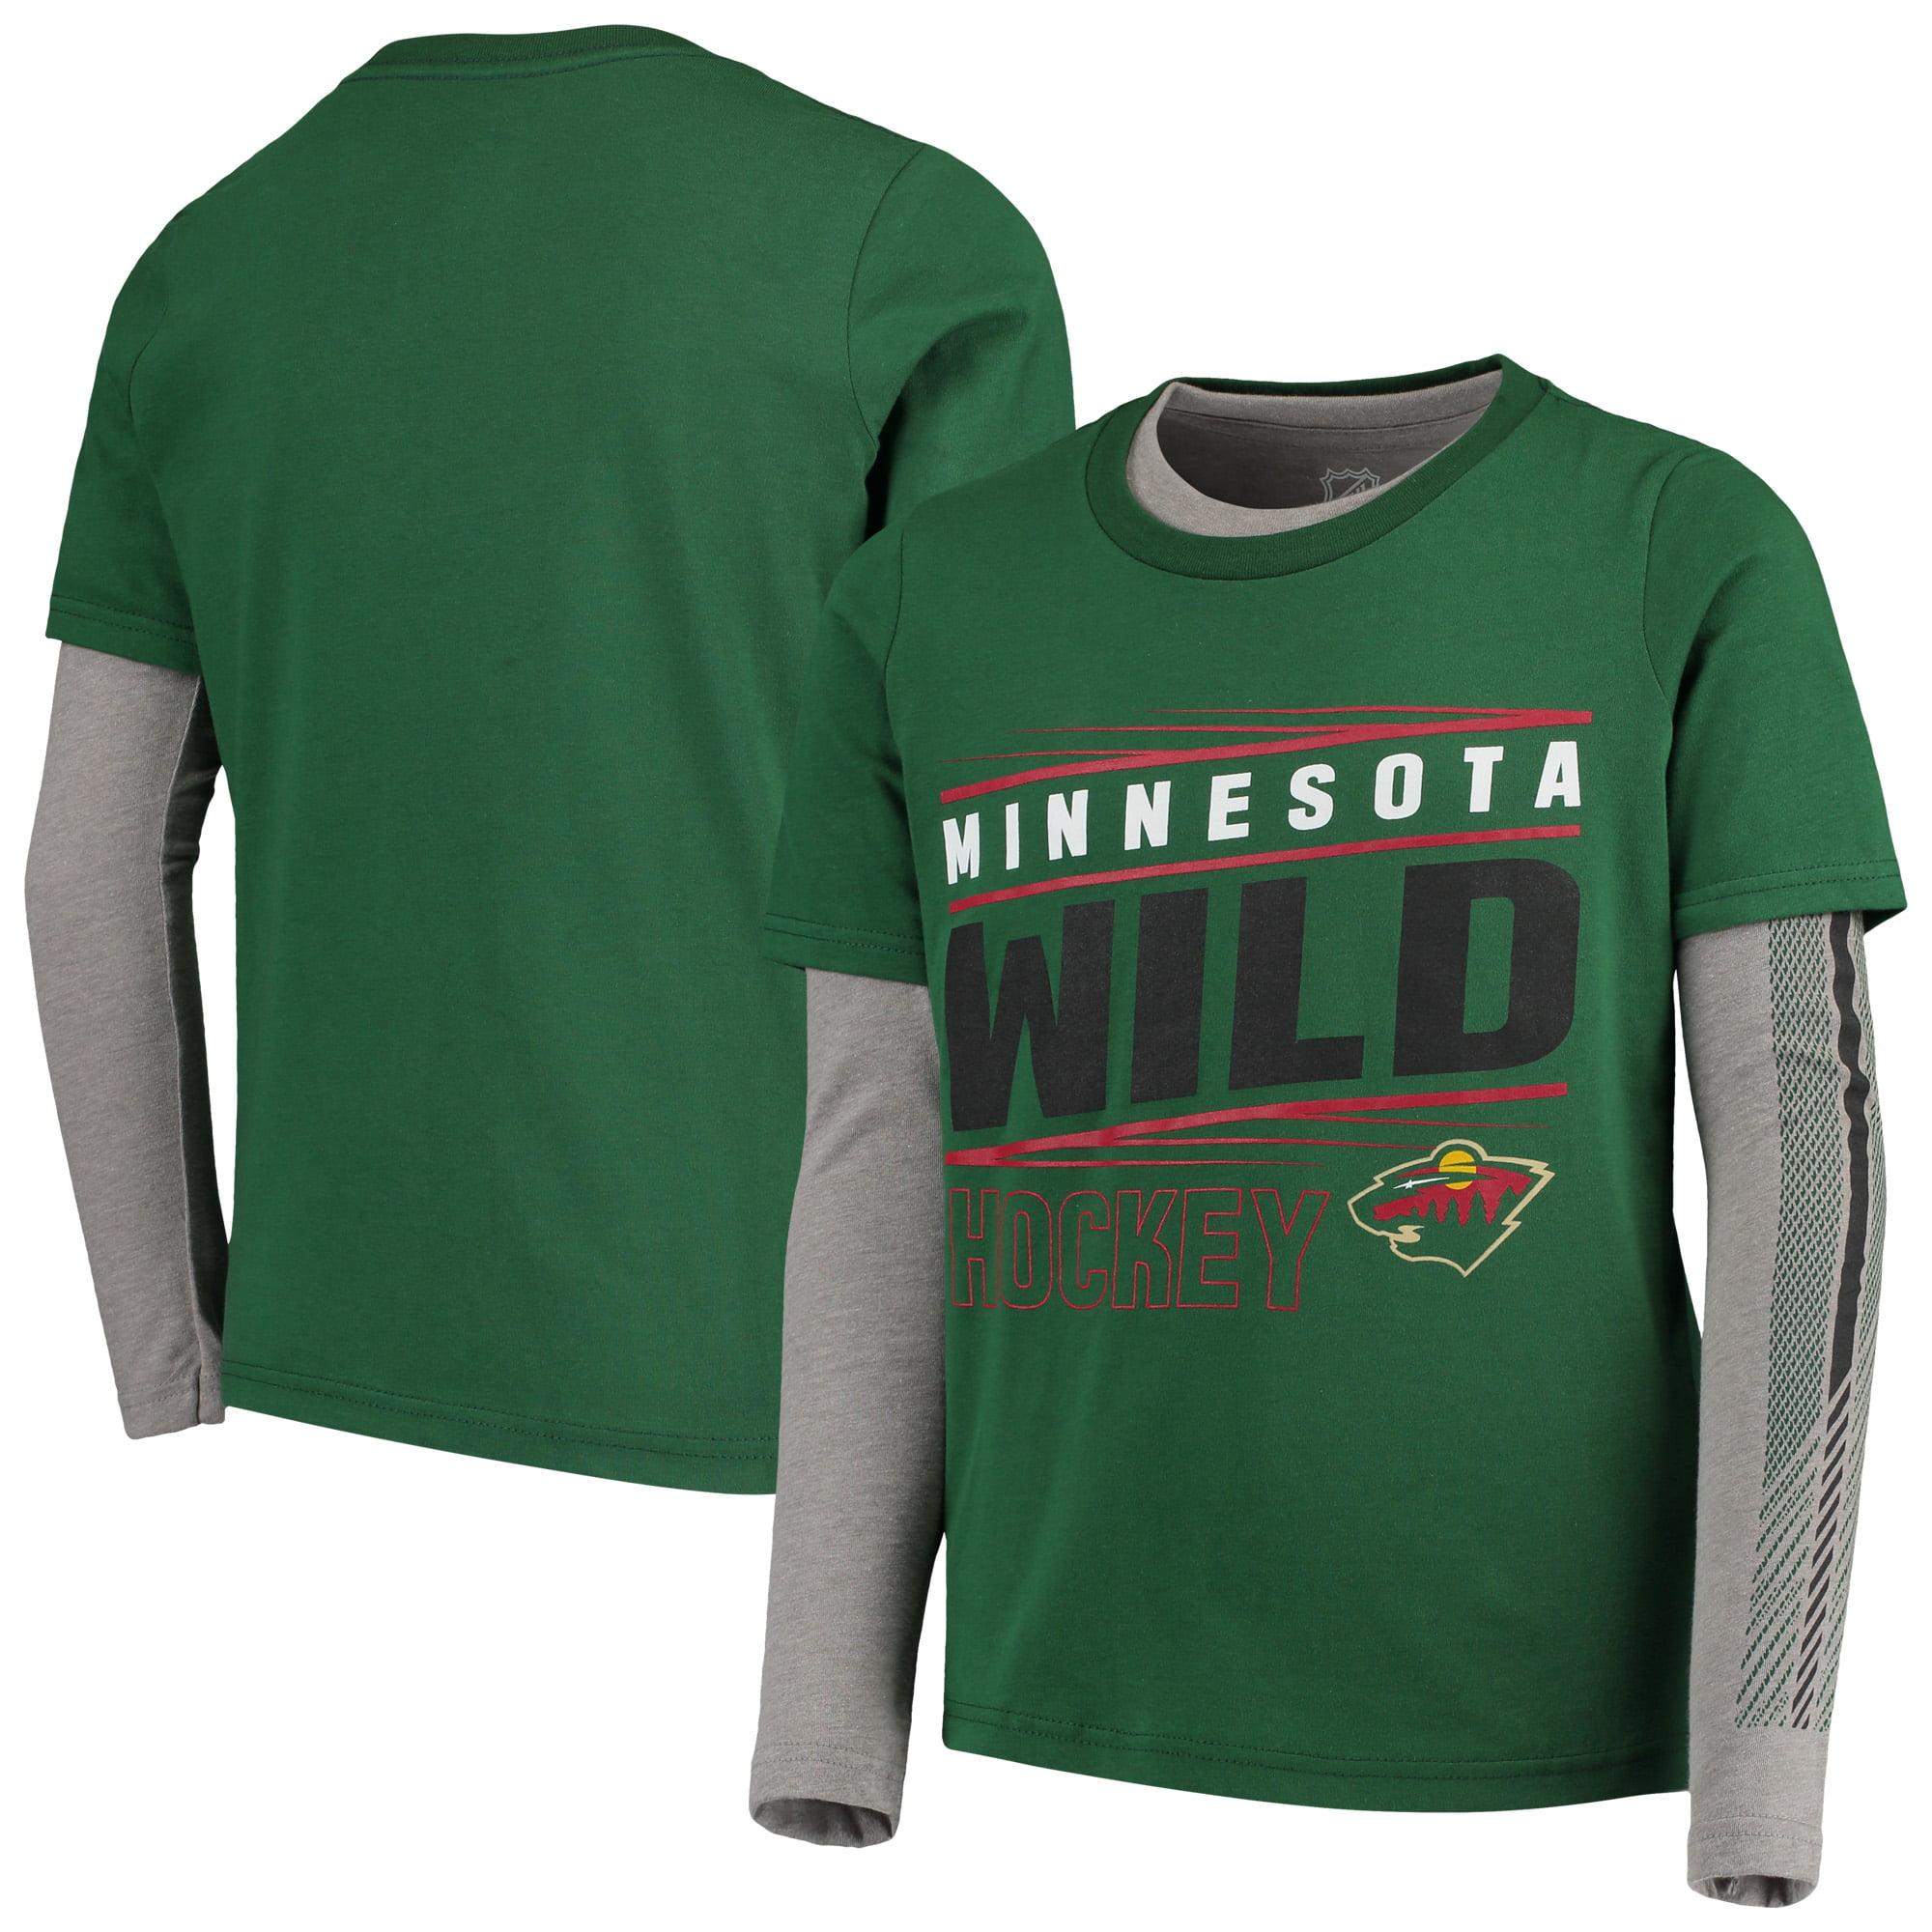 Minnesota Wild Youth Binary 2-In-1 Long Sleeve/Short Sleeve T-Shirt Set - Green/Gray